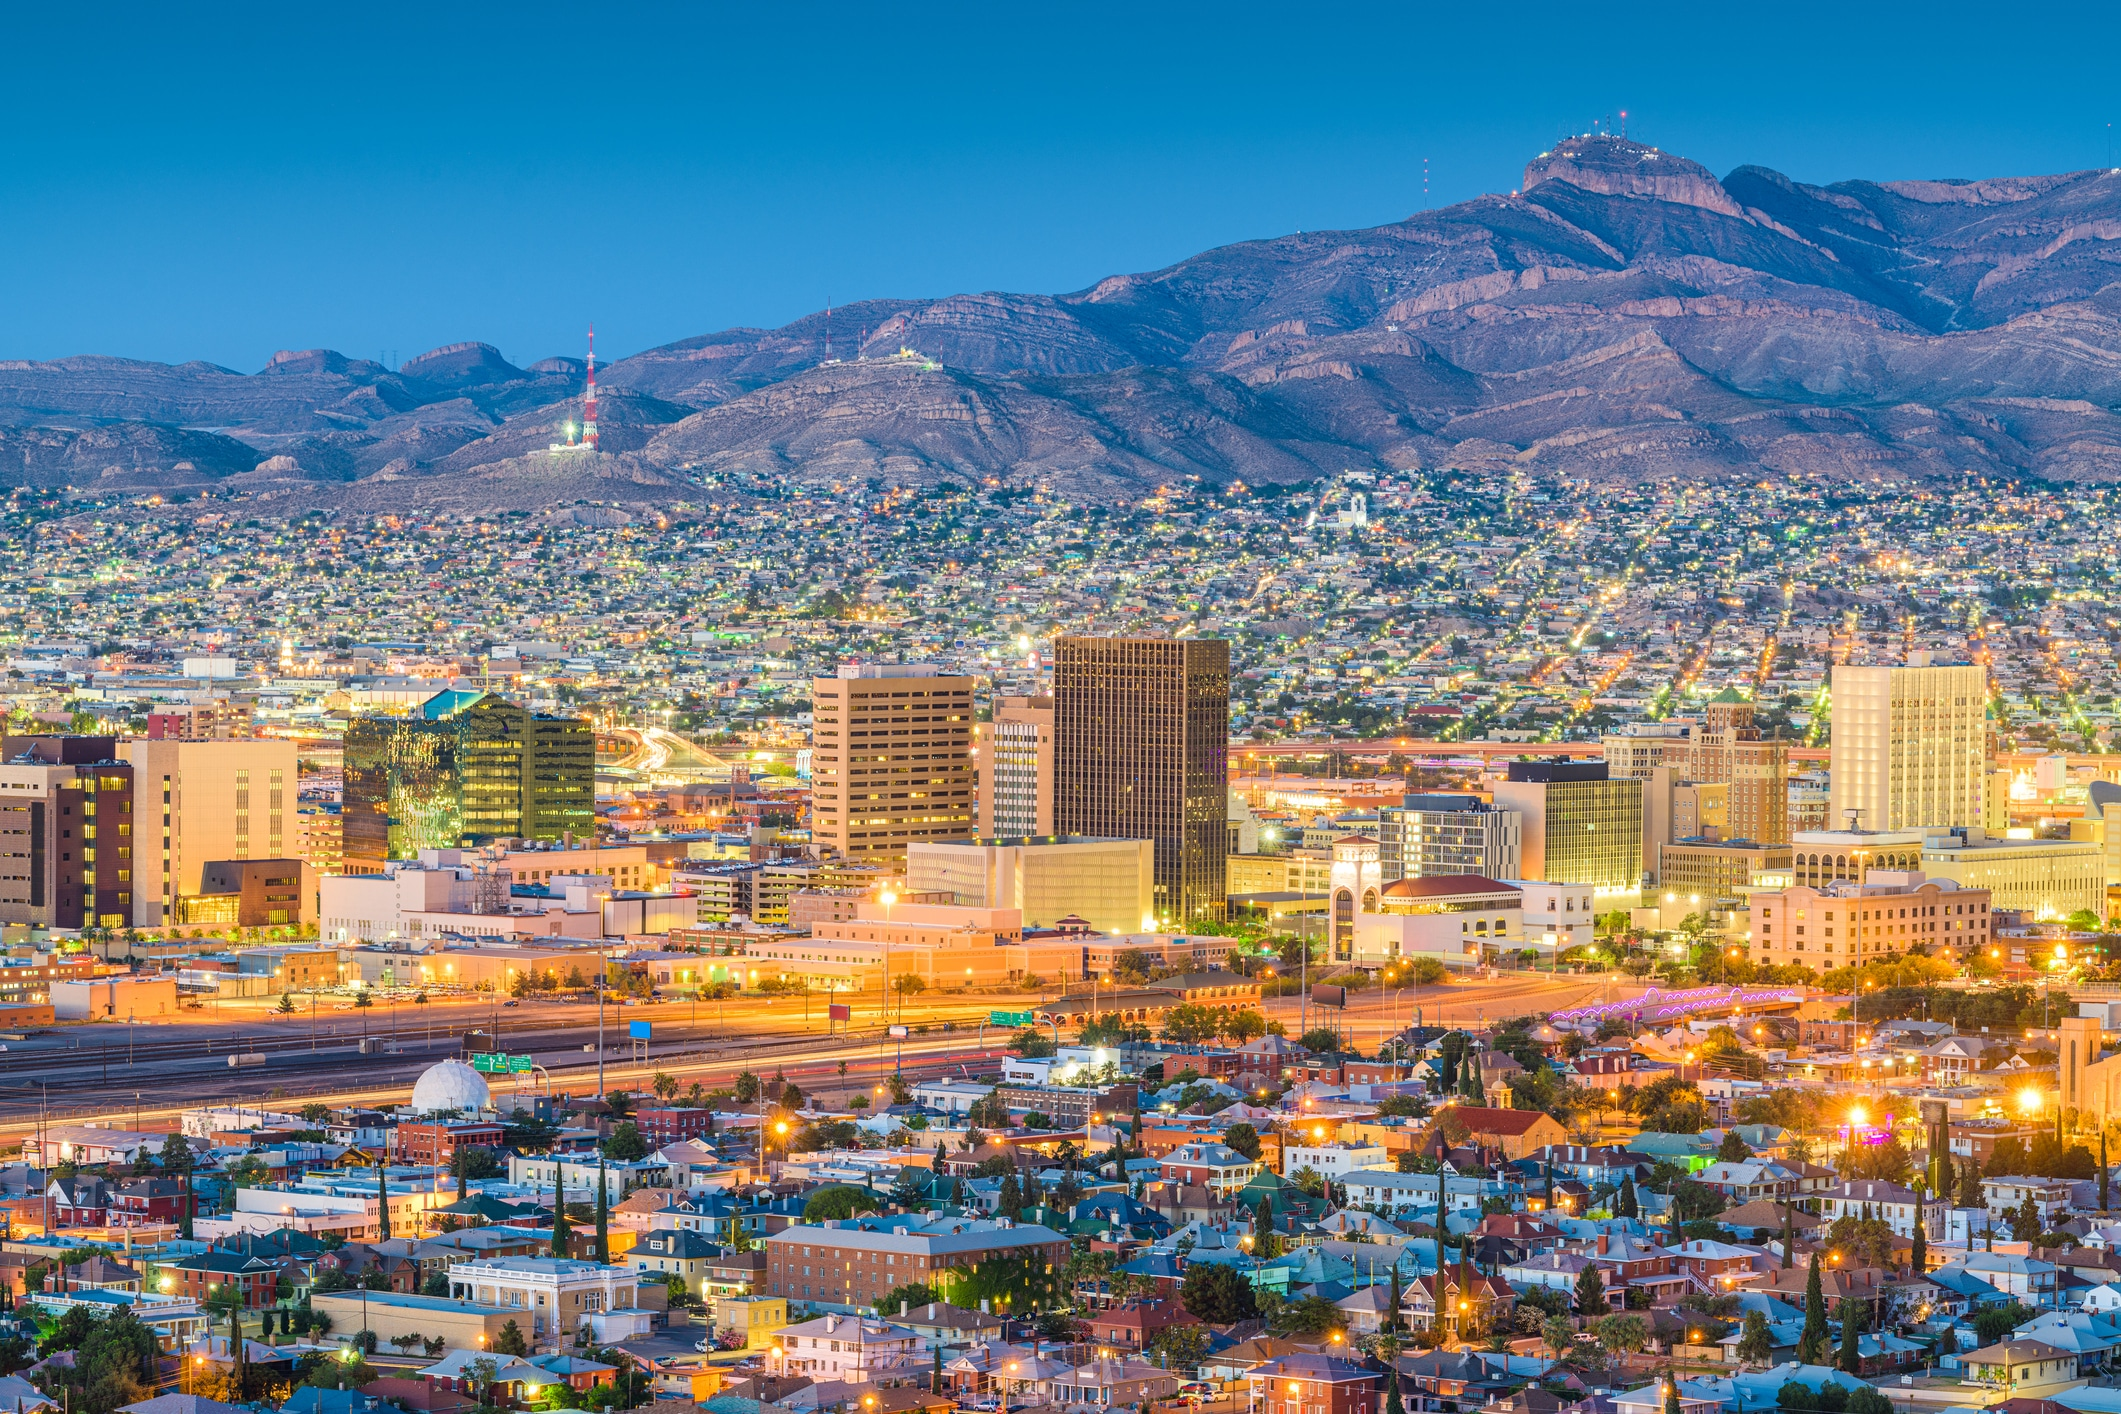 EL PASO MPO 2045 METROPOLITAN TRANSPORTATION PLAN UPDATE